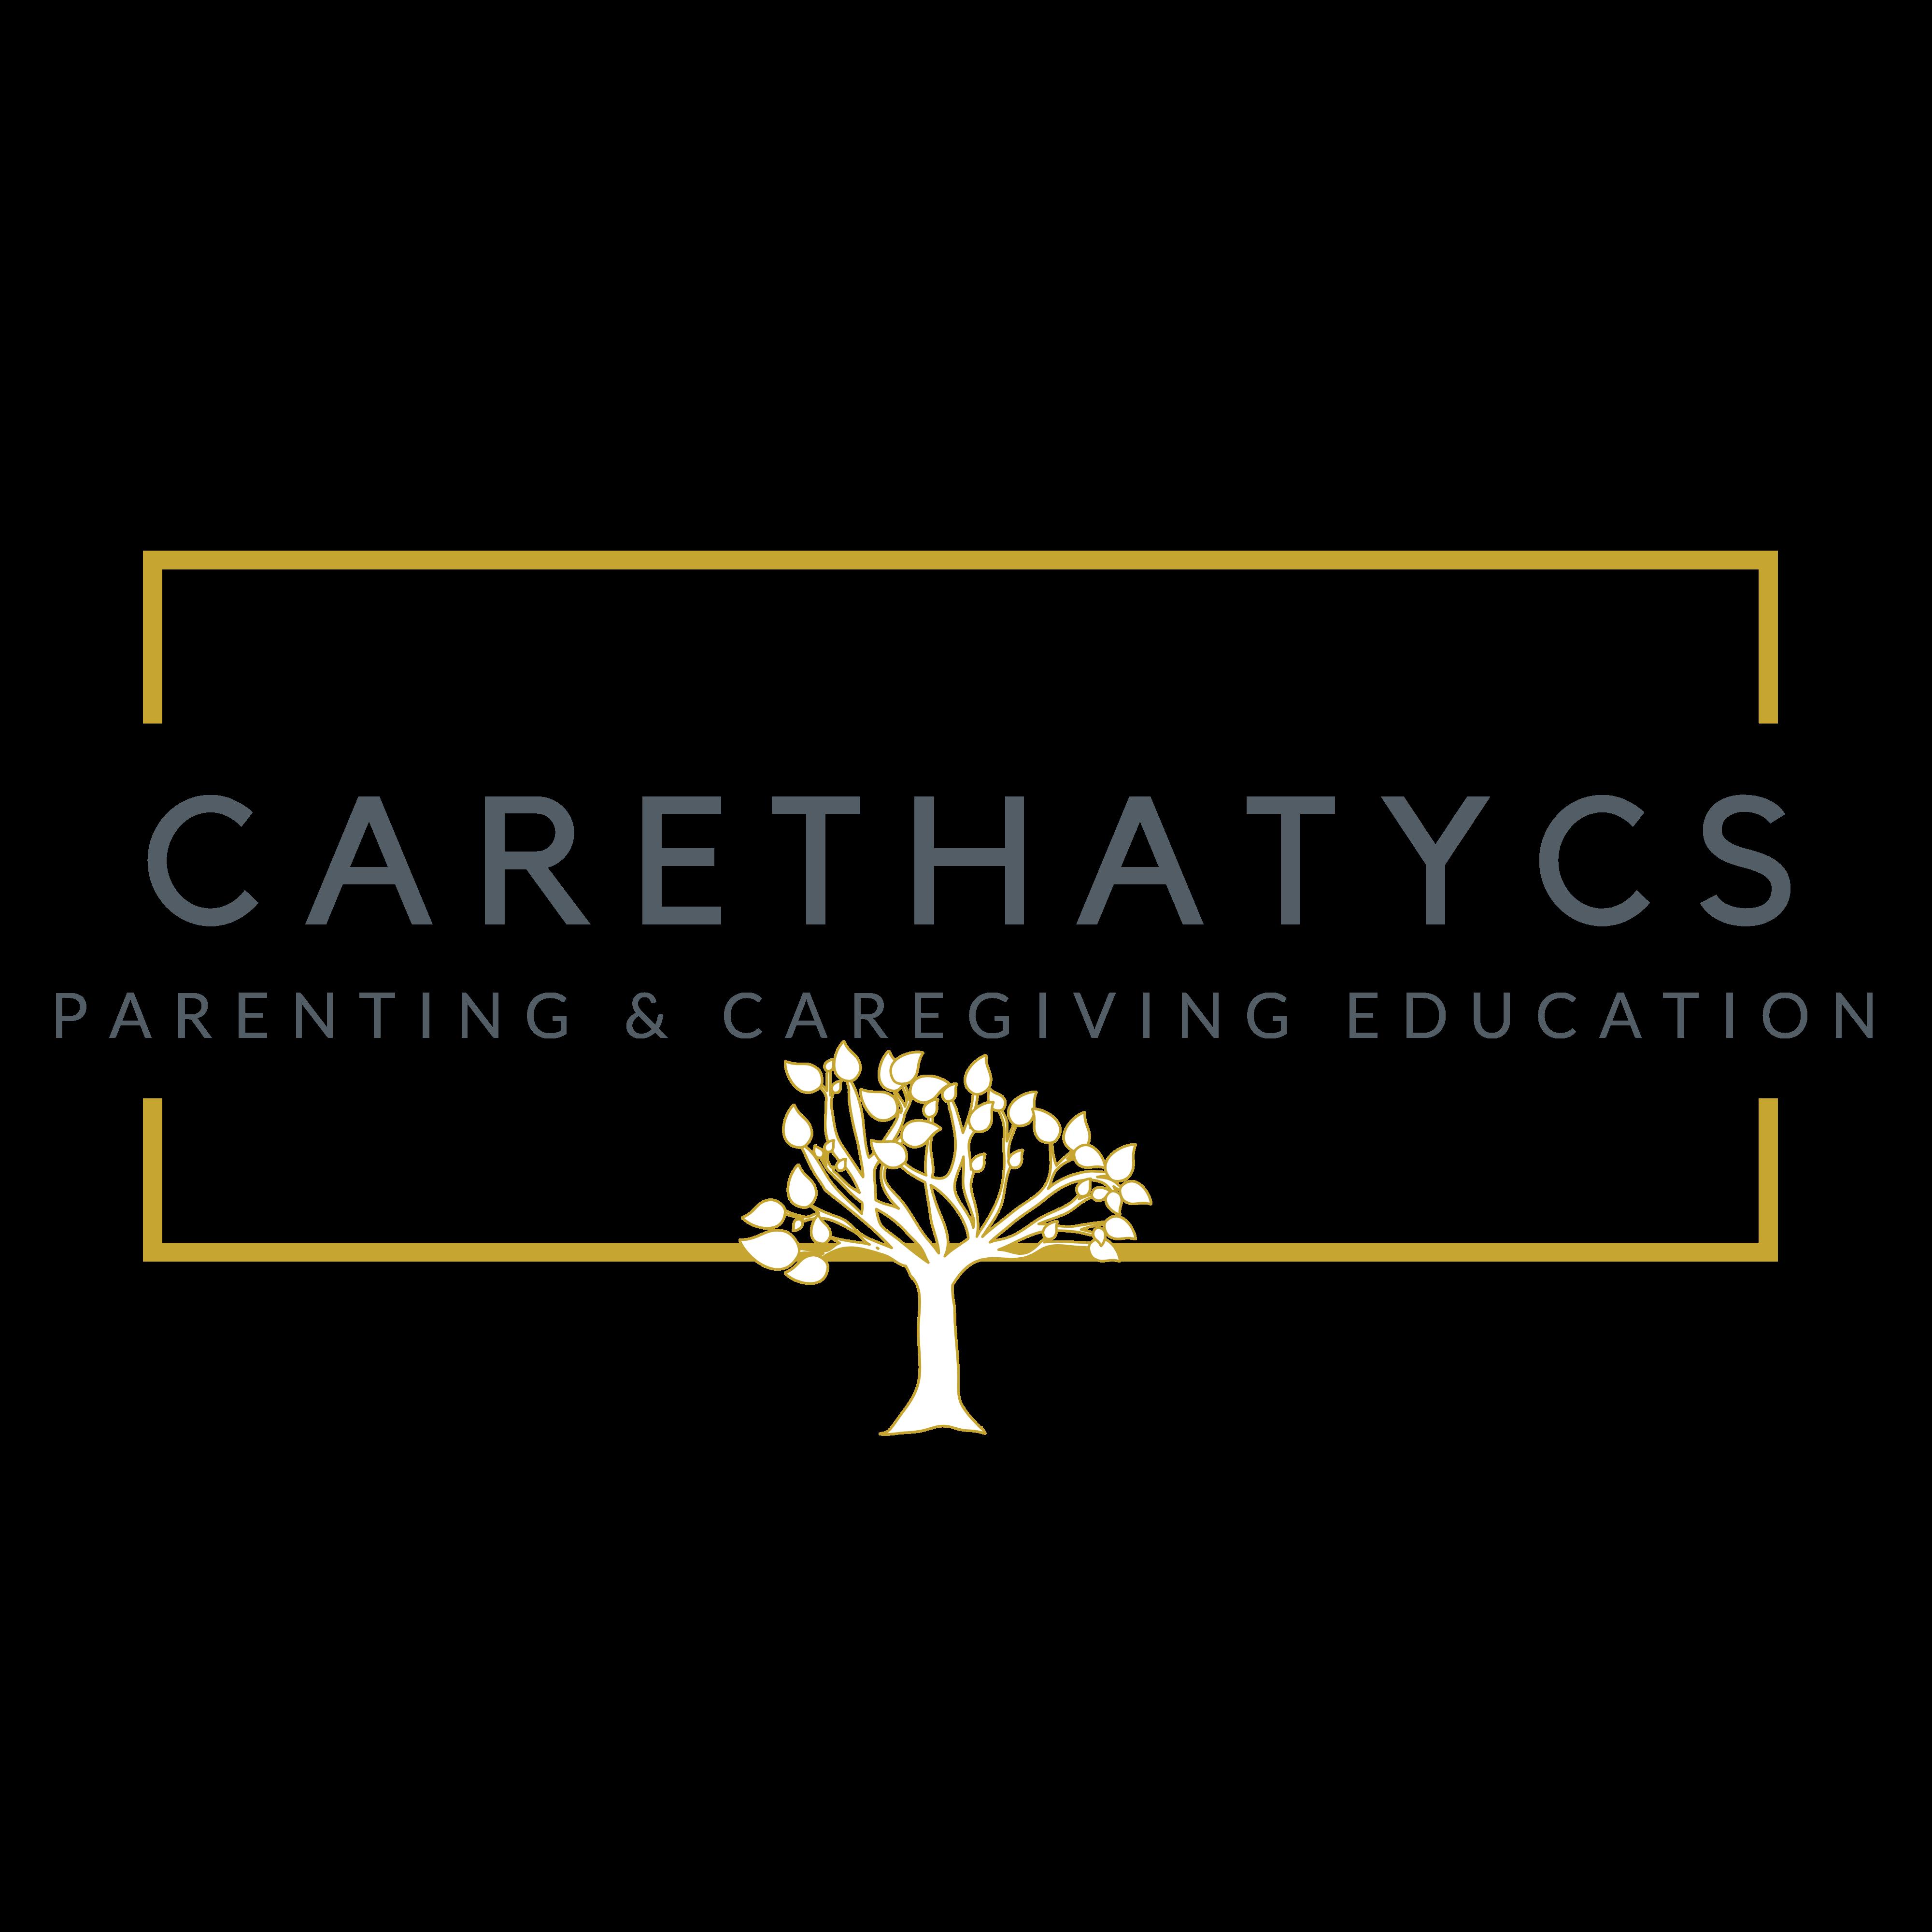 CARETHATYCS